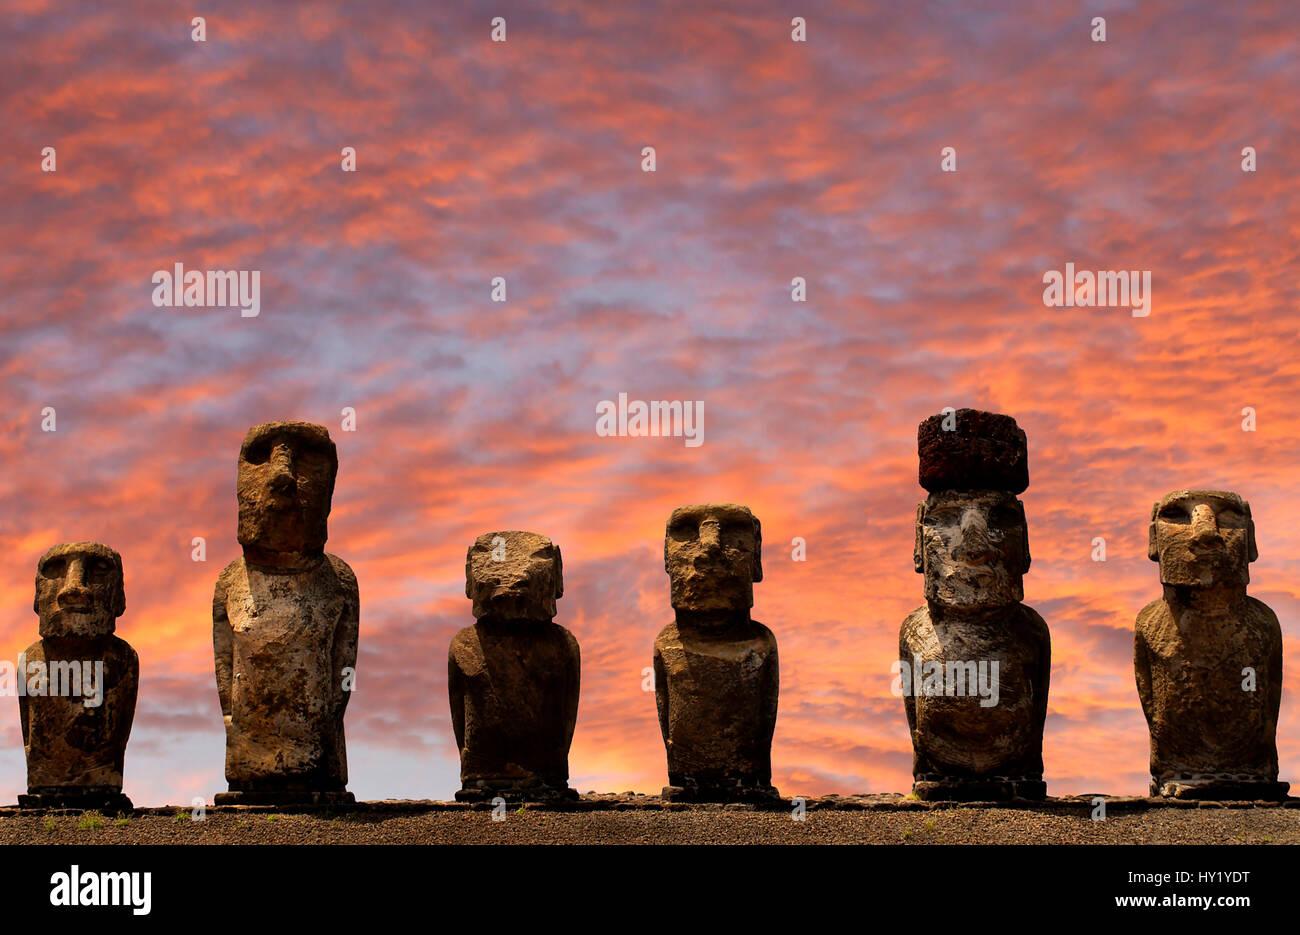 Dieses Bild zeigt 6 Moai Statuen am Ahu Tongariki auf der Osterinsel Stockbild